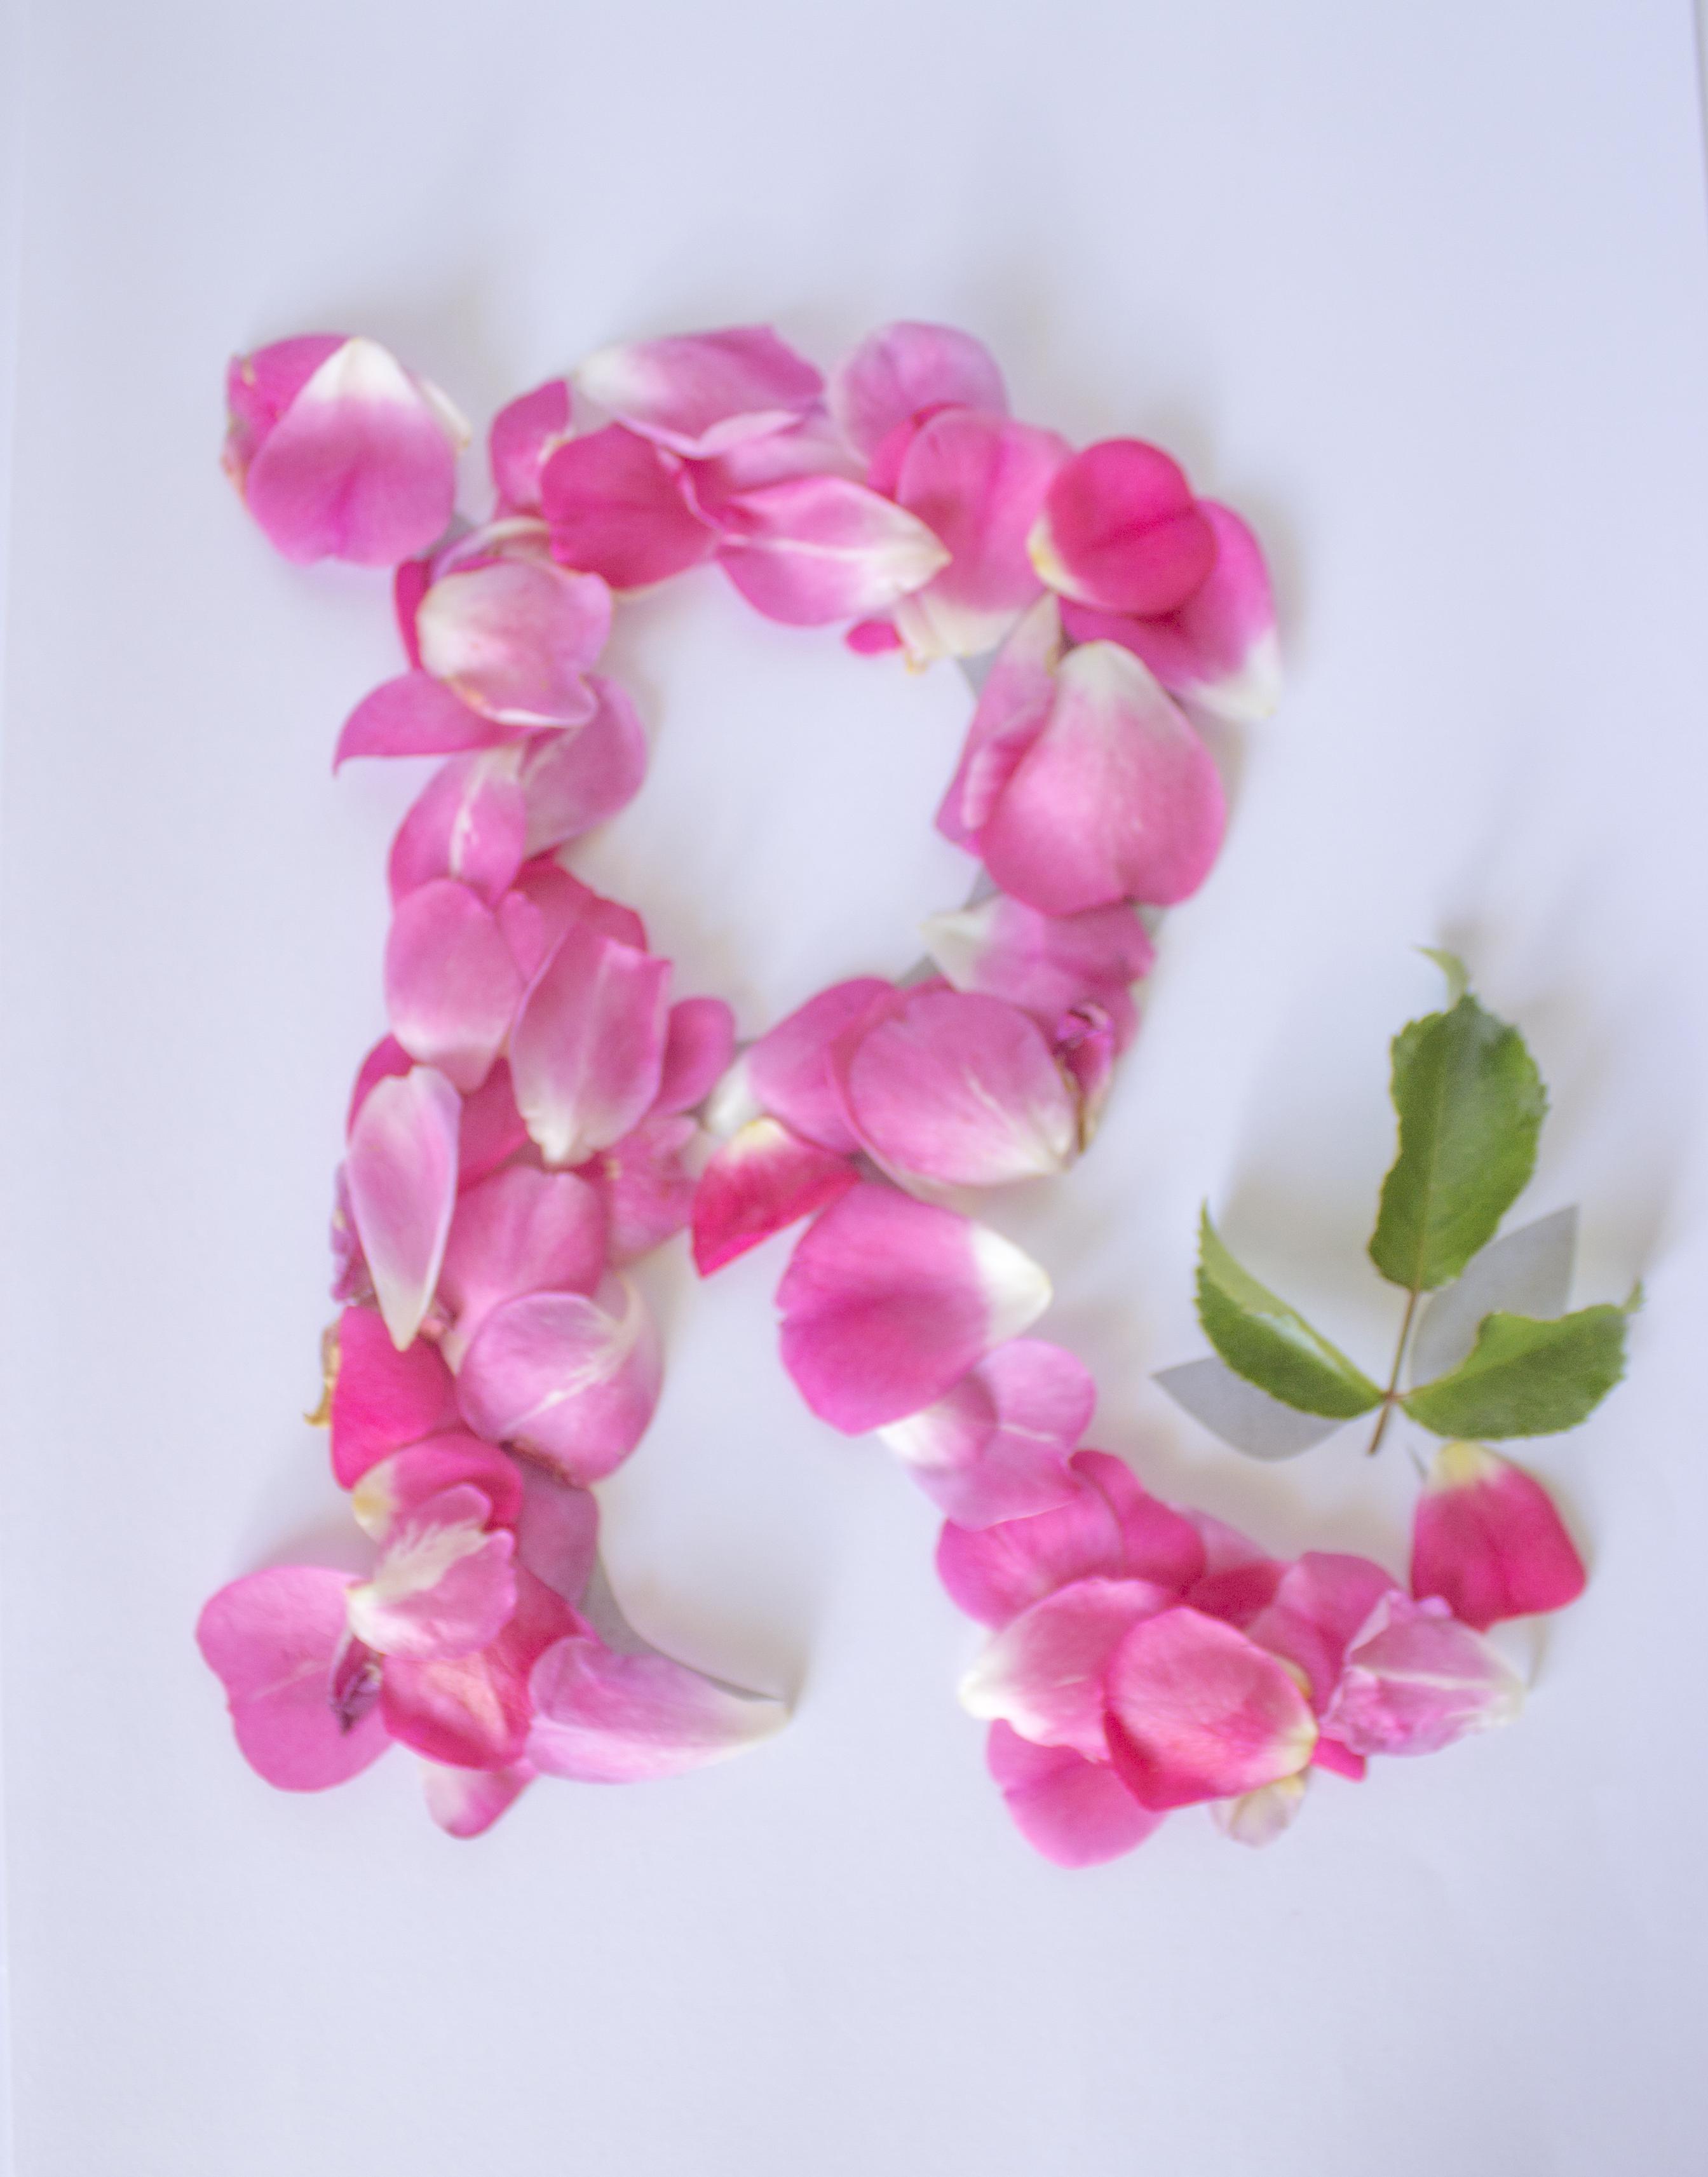 Pretty Floral Letter R Floral Letters Flower Letters Flower Words